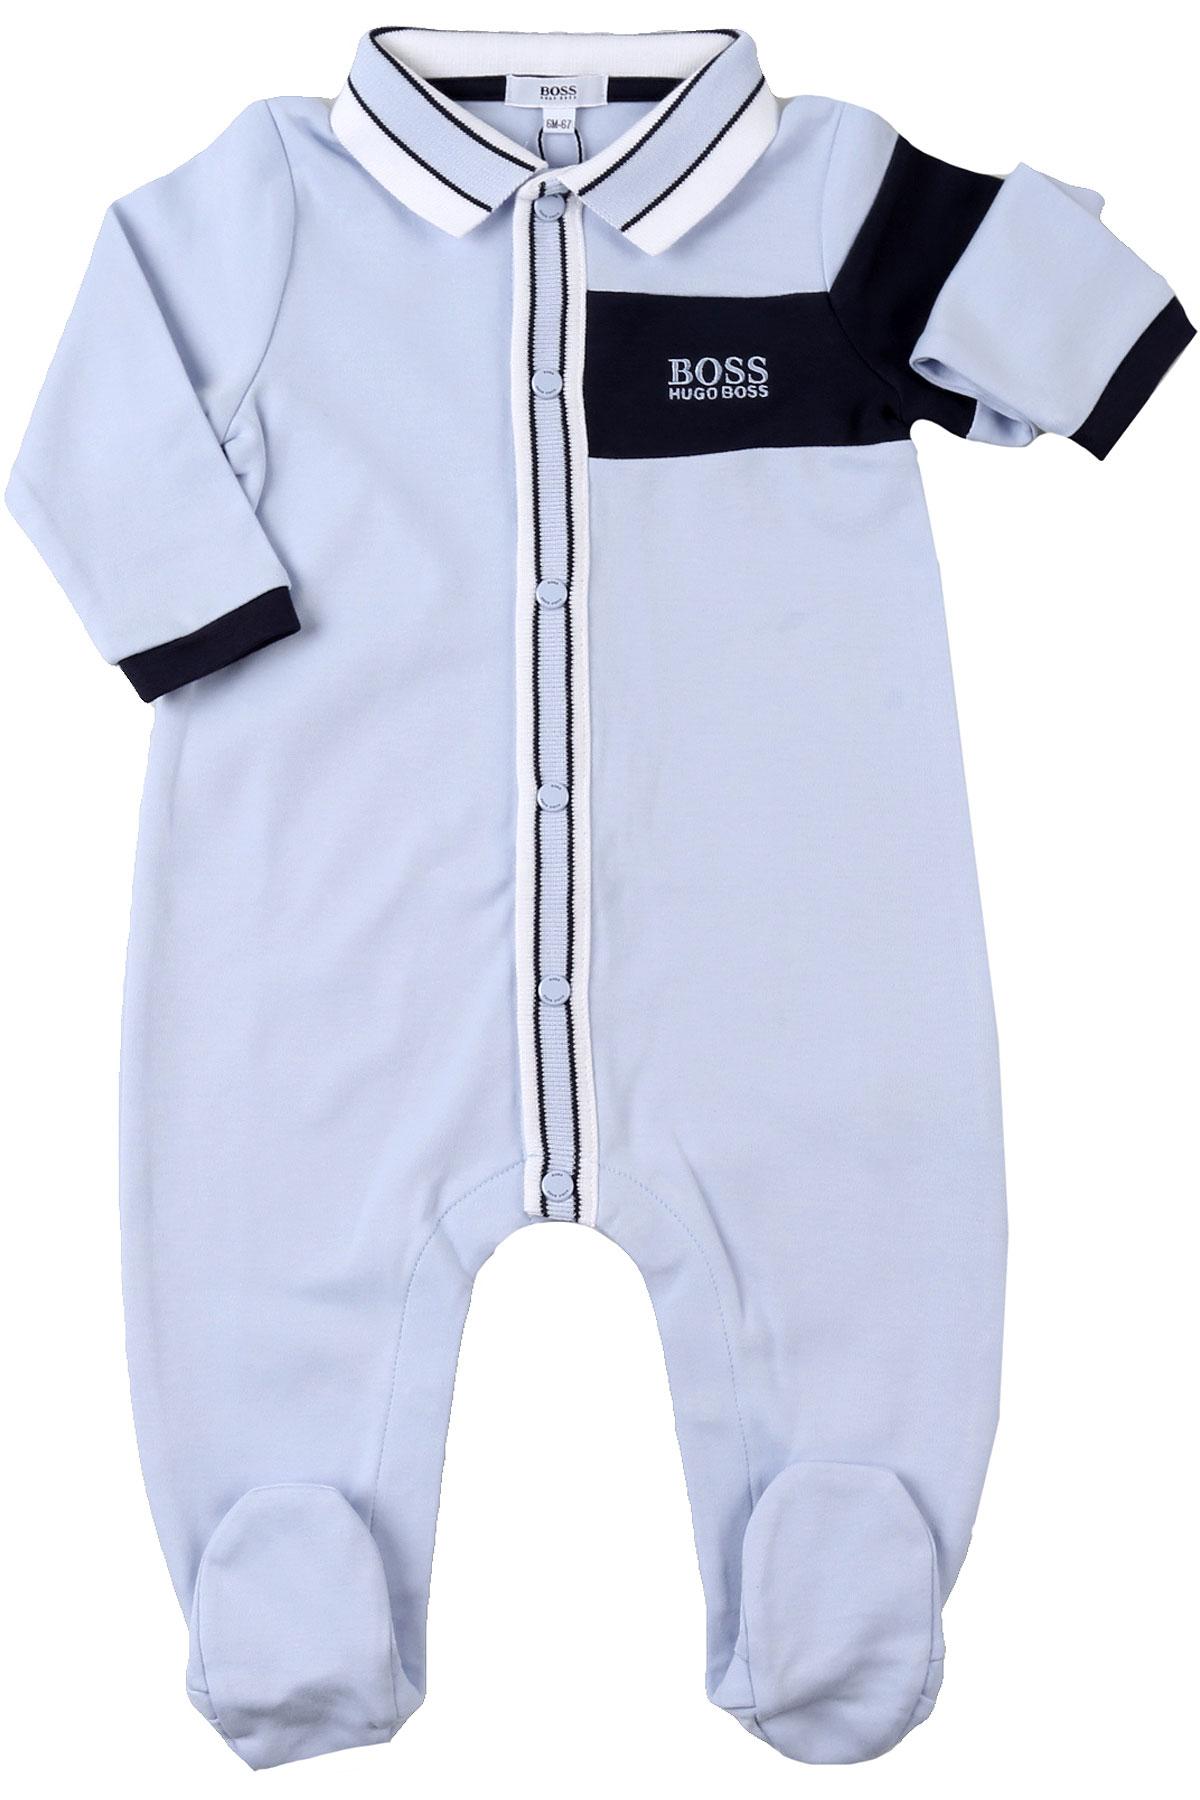 Hugo Boss Baby Bodysuits & Onesies for Boys On Sale, Sky, Cotton, 2019, 3M 6M